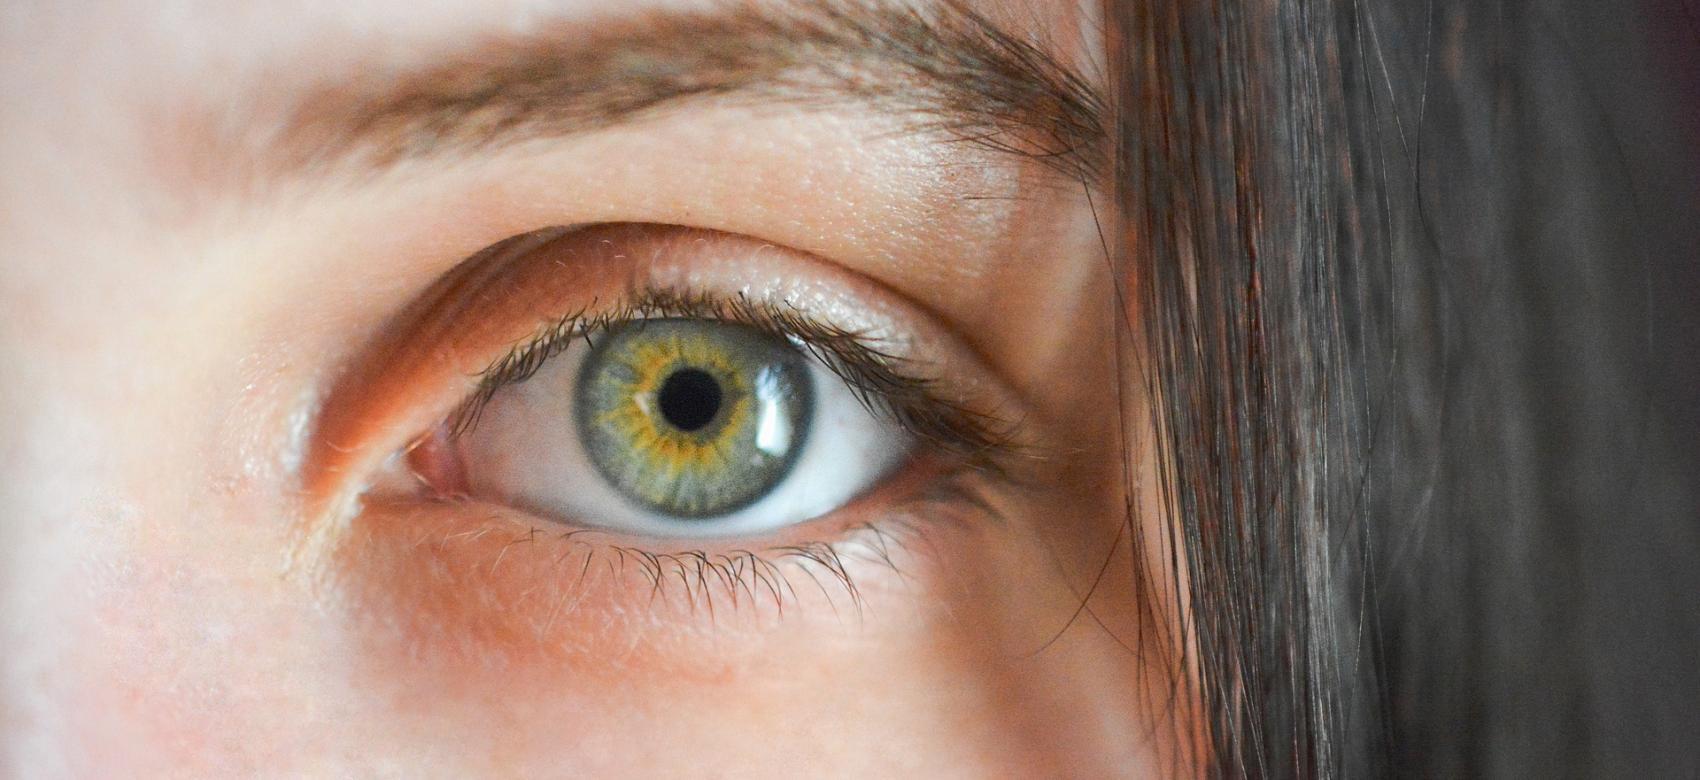 Primer plano de un ojo